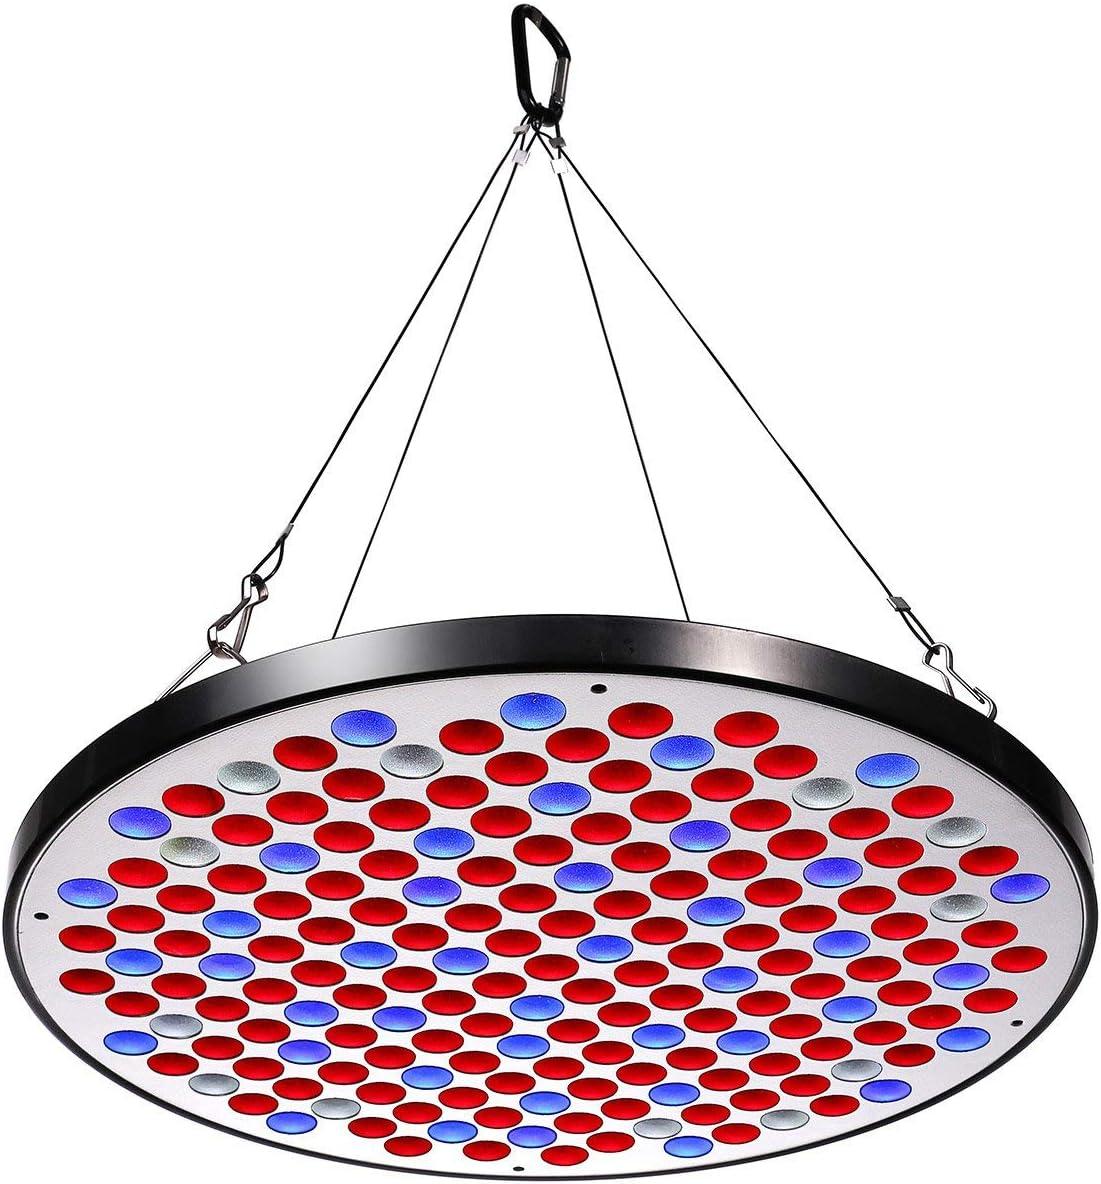 Niello Panel de luz LED Grow Serie 50W, Diseño Ultrafino Espectro Completo con 177Pcs Big Chip Leds actualizados, para Plantas de Interior en Crecimiento y floración